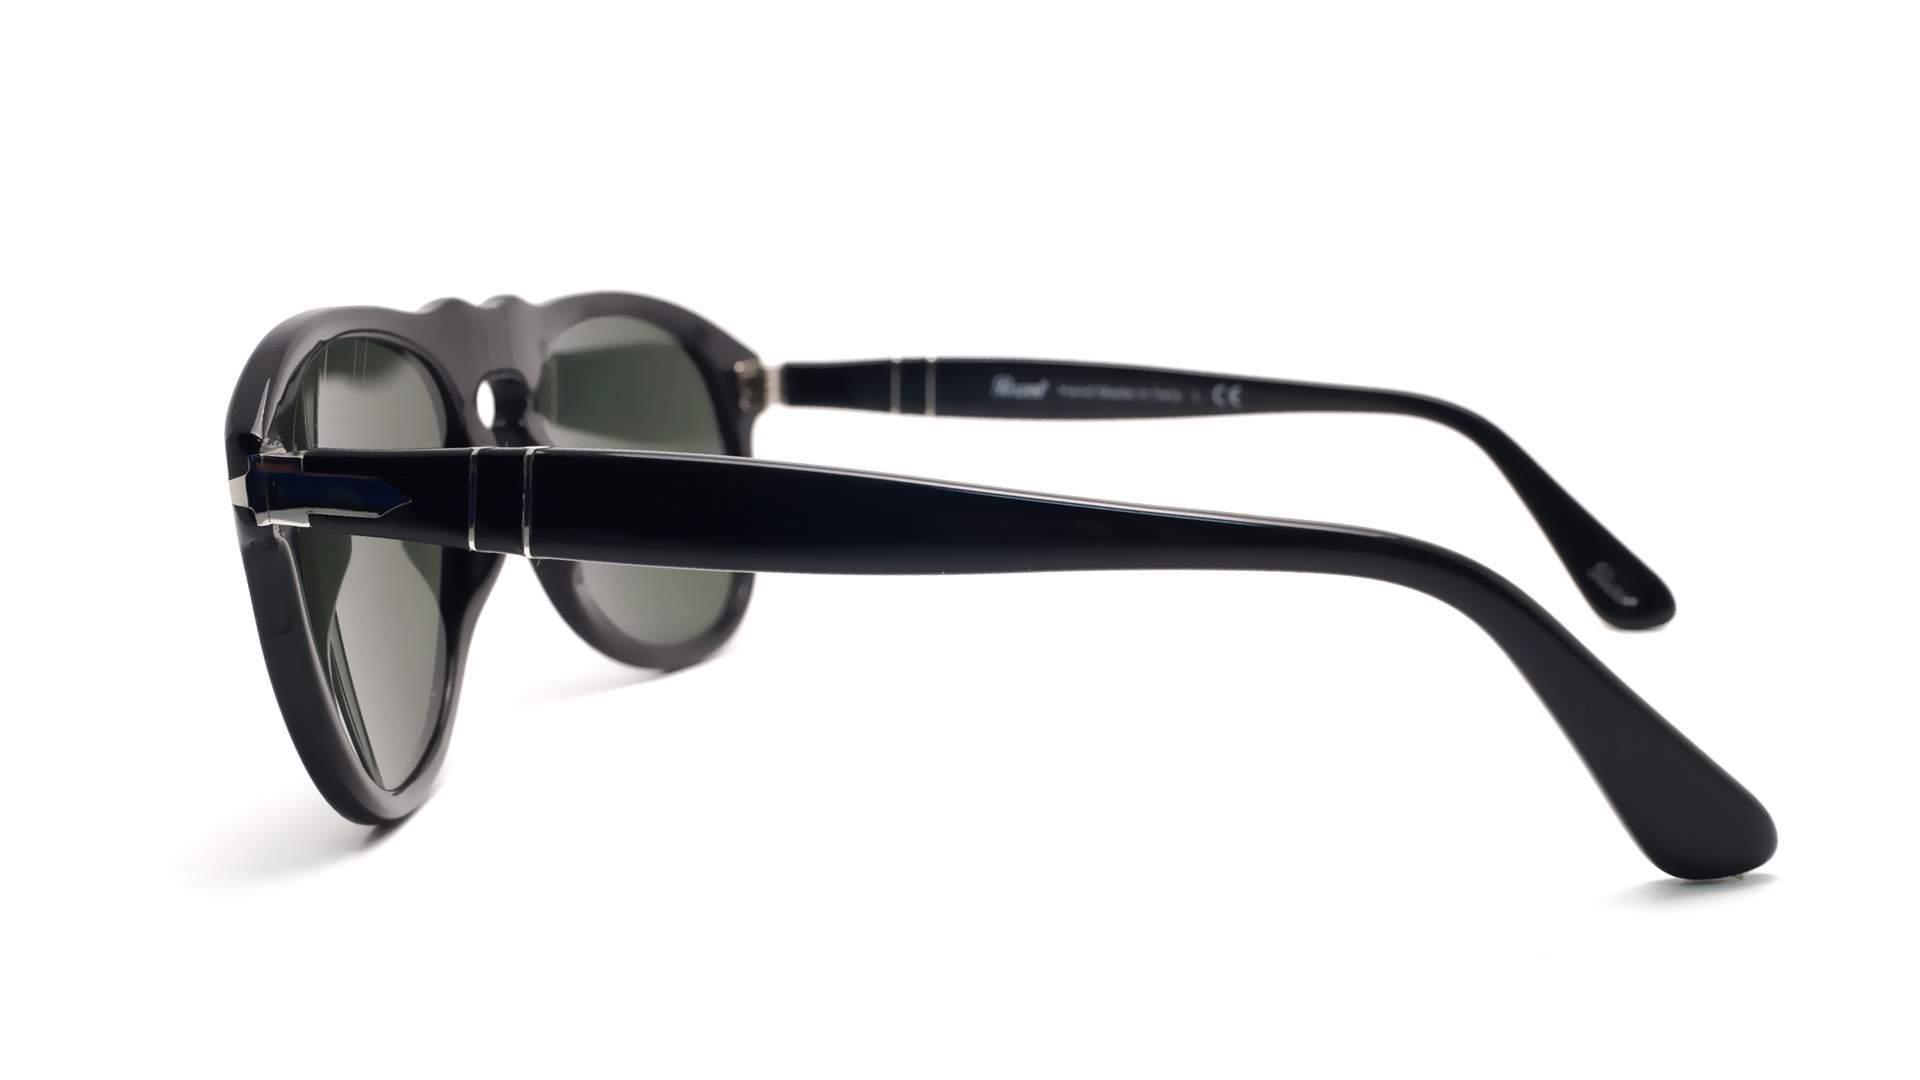 2a58fed891 Sunglasses Persol 649 Goldiginal Black PO0649 95 31 56-20 Large